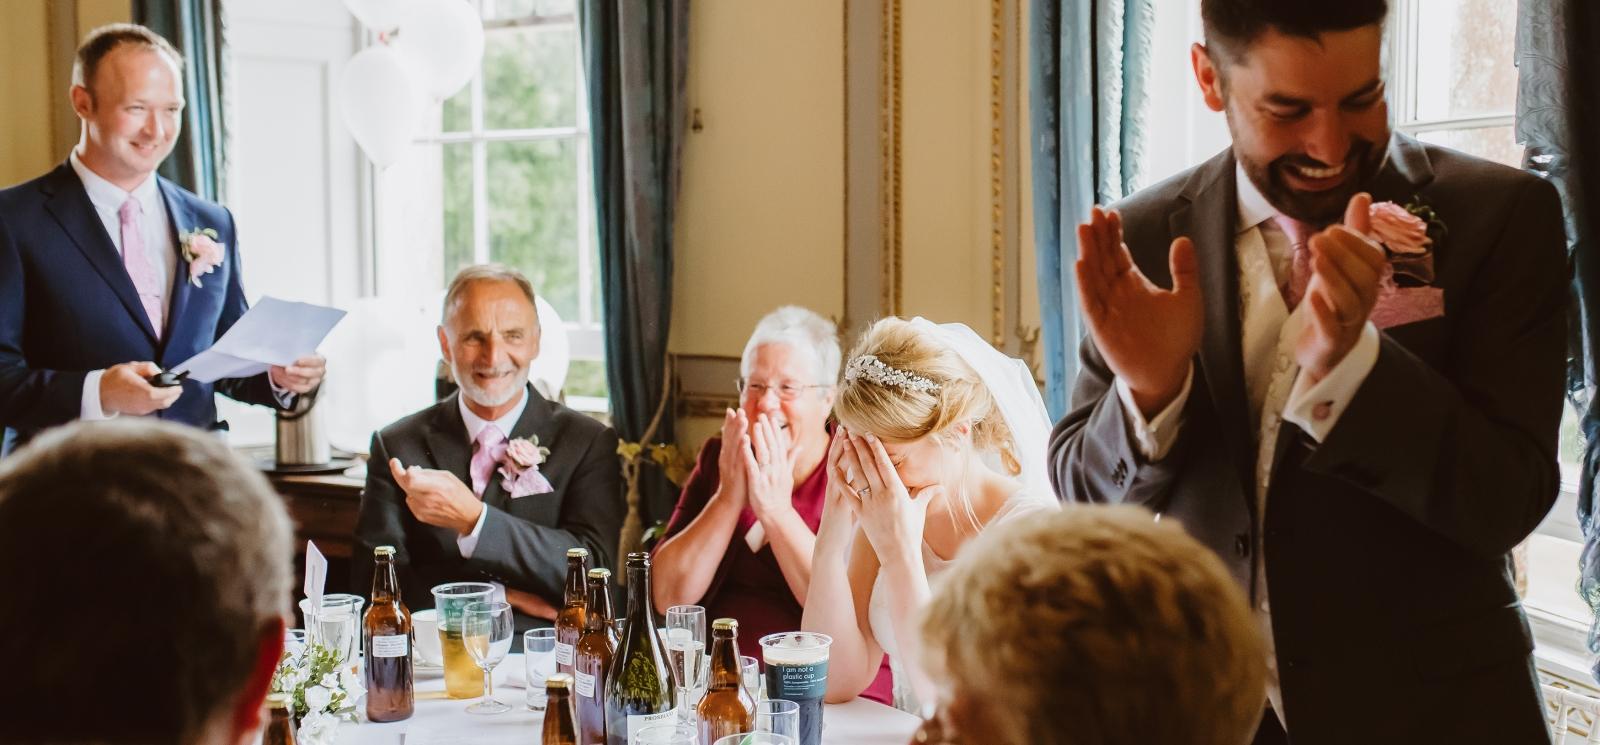 9 Documentary Wedding Photography in Torquay, Exeter, Devon - funny speech reactions